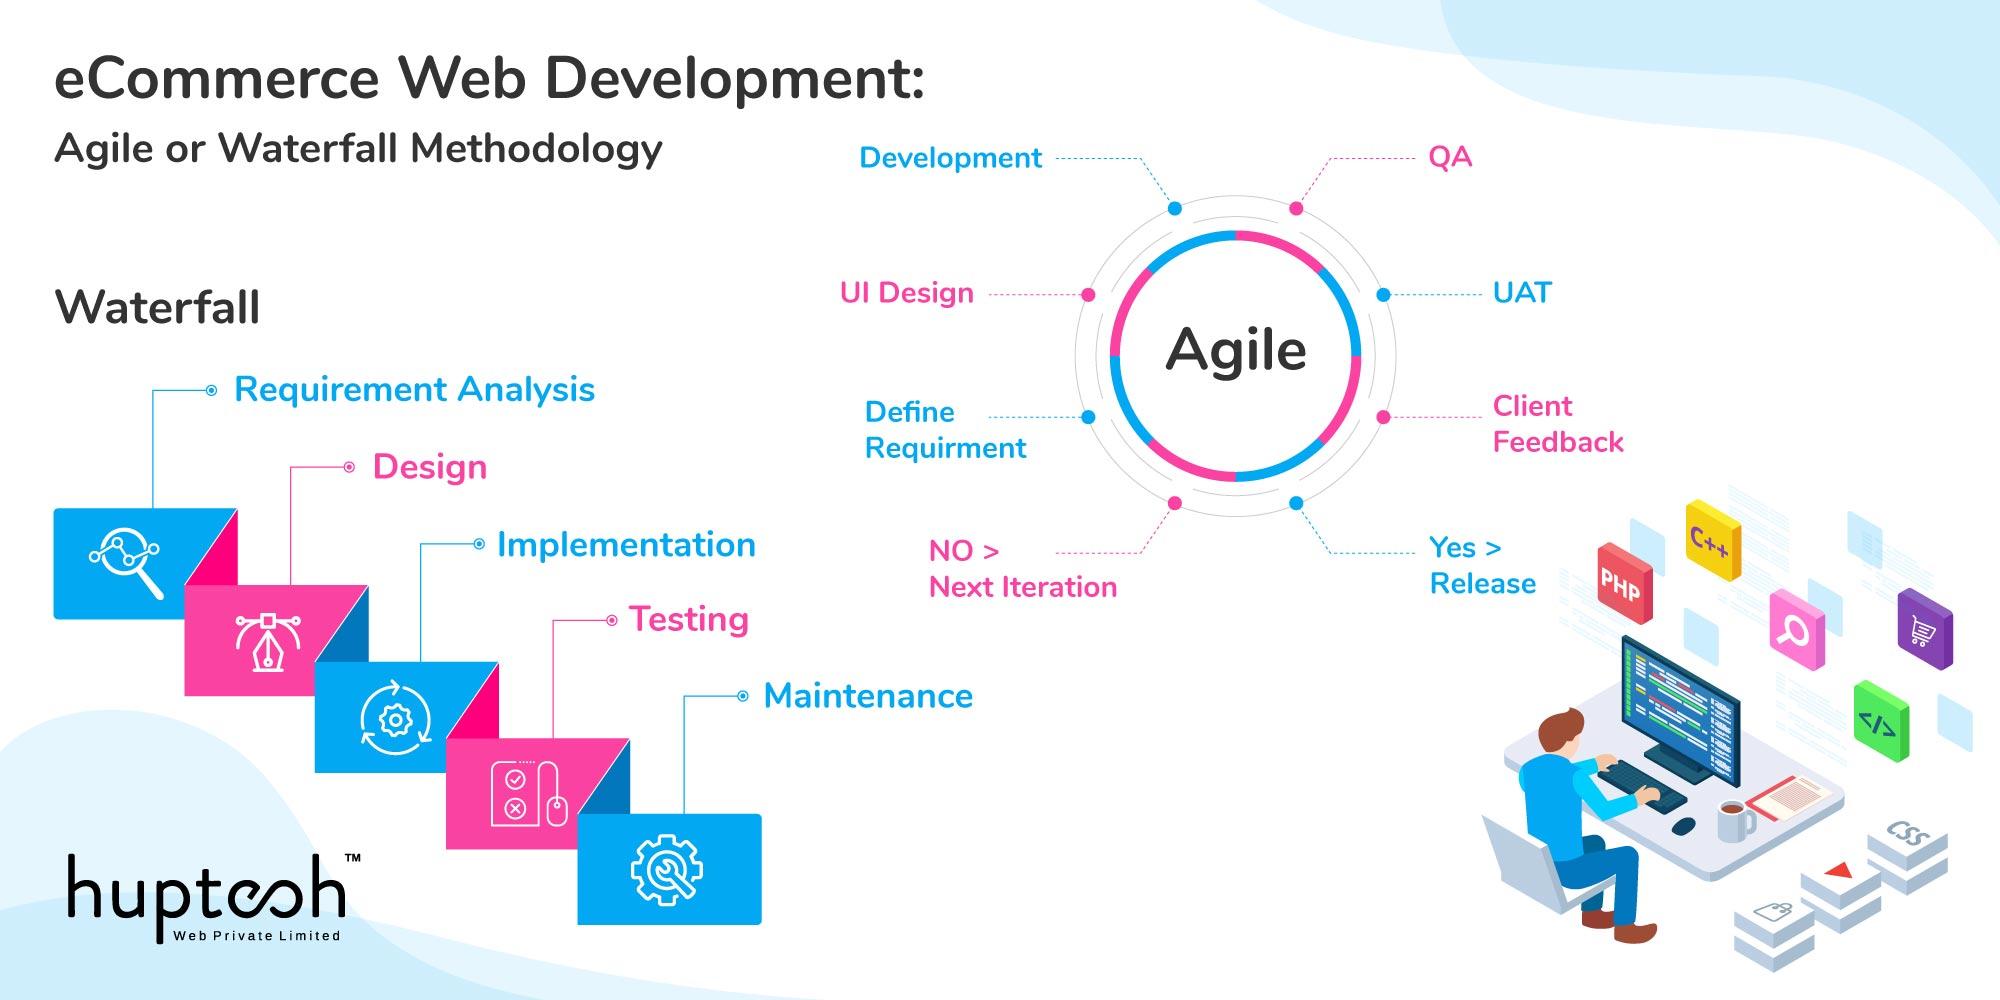 Ecommerce Web Development Agile Vs Waterfall Methodology